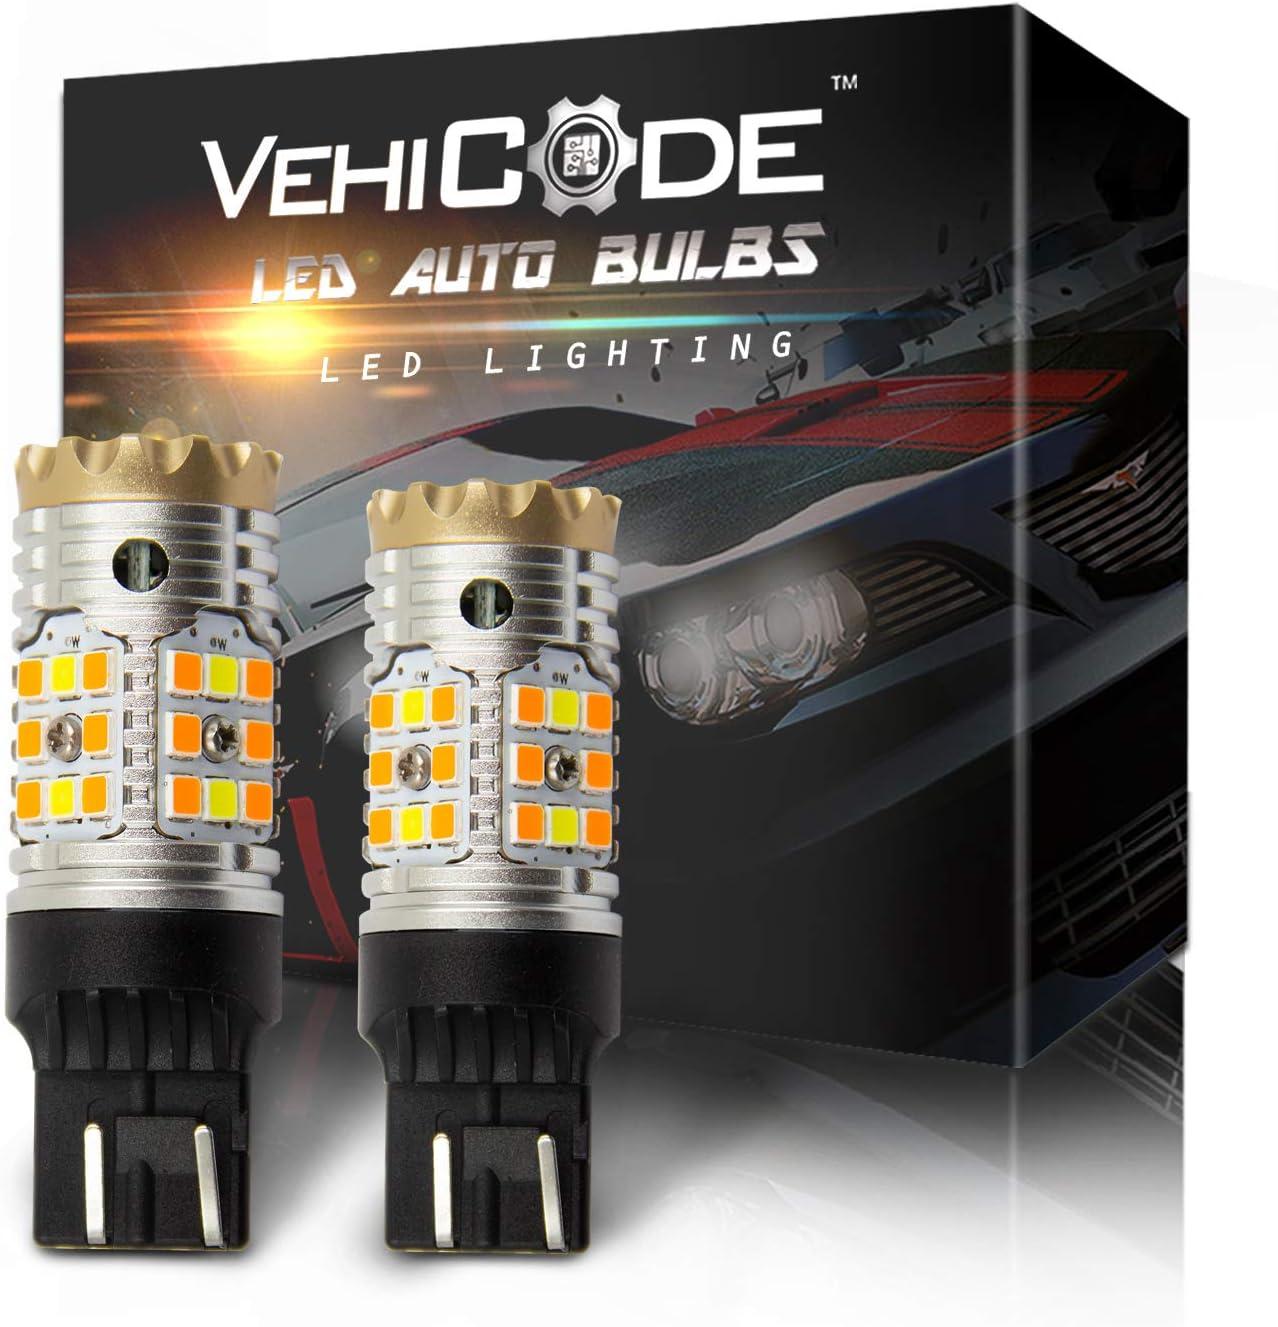 VehiCode CanBus Japan Maker New Error Free Large-scale sale 7443 7444 Amber Light White Bulb LED